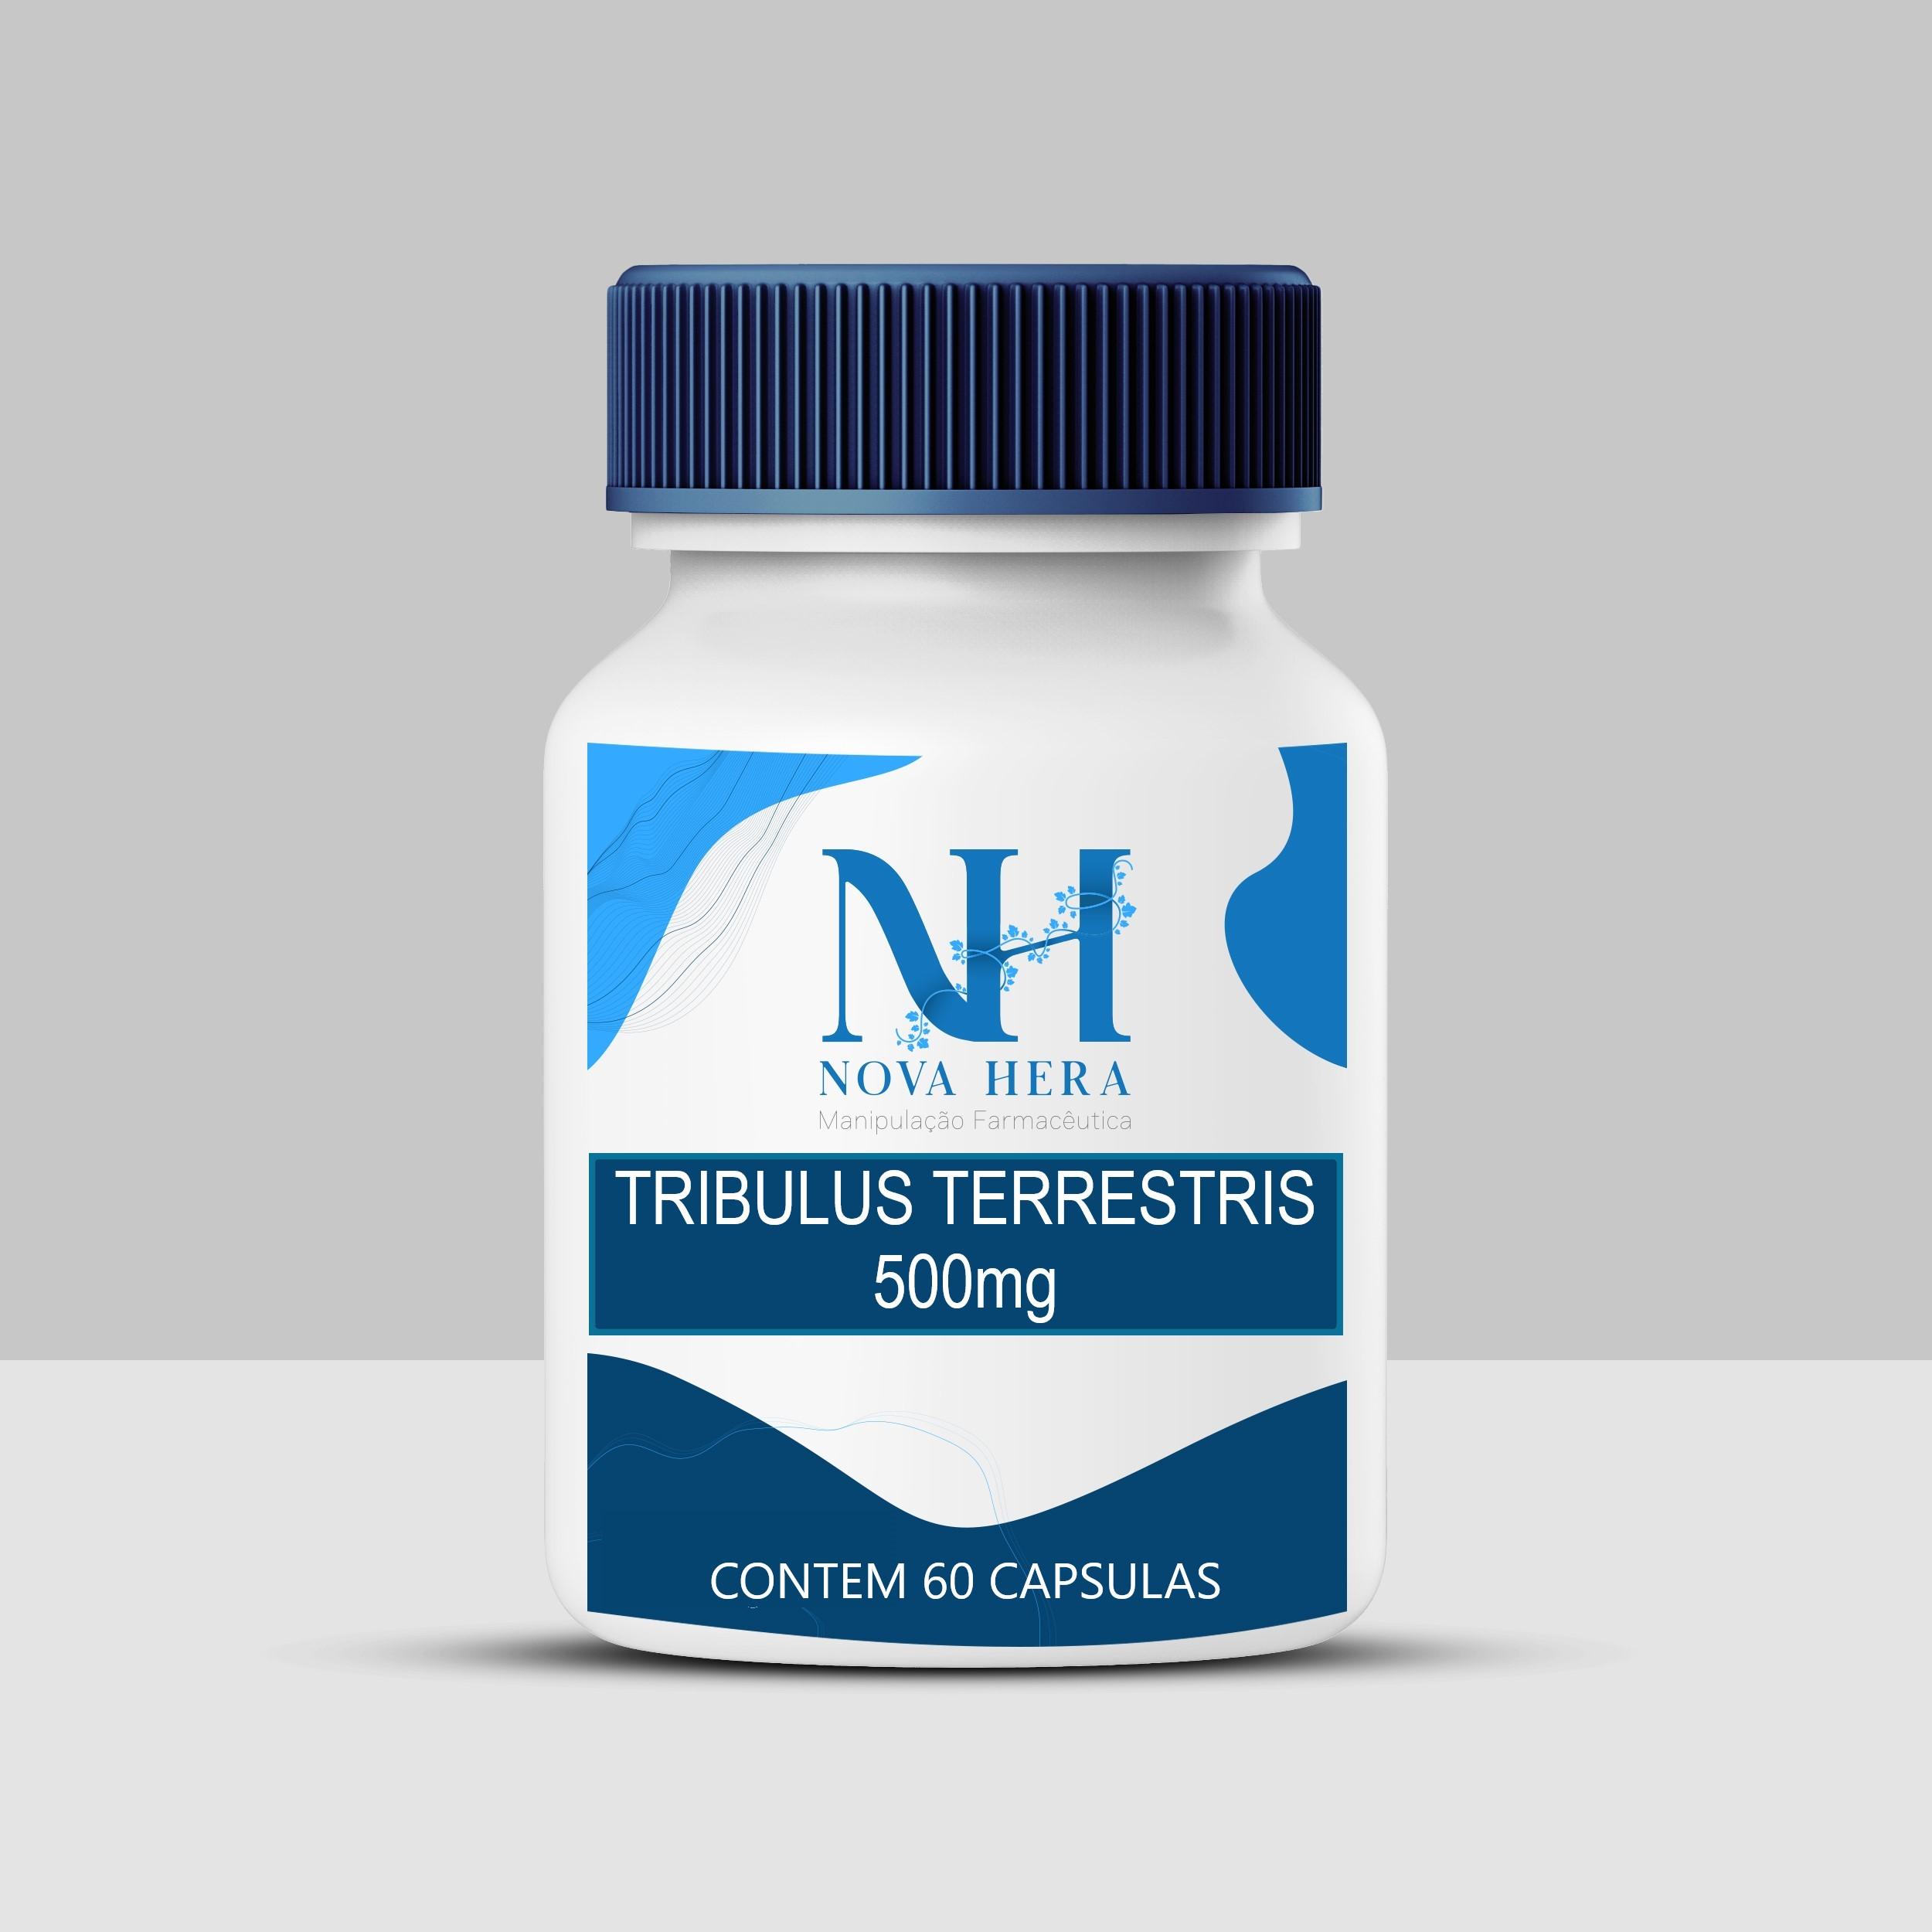 https://www.farmacianovahera.com.br/view/_upload/produto/98/1595266003tribulus.jpg